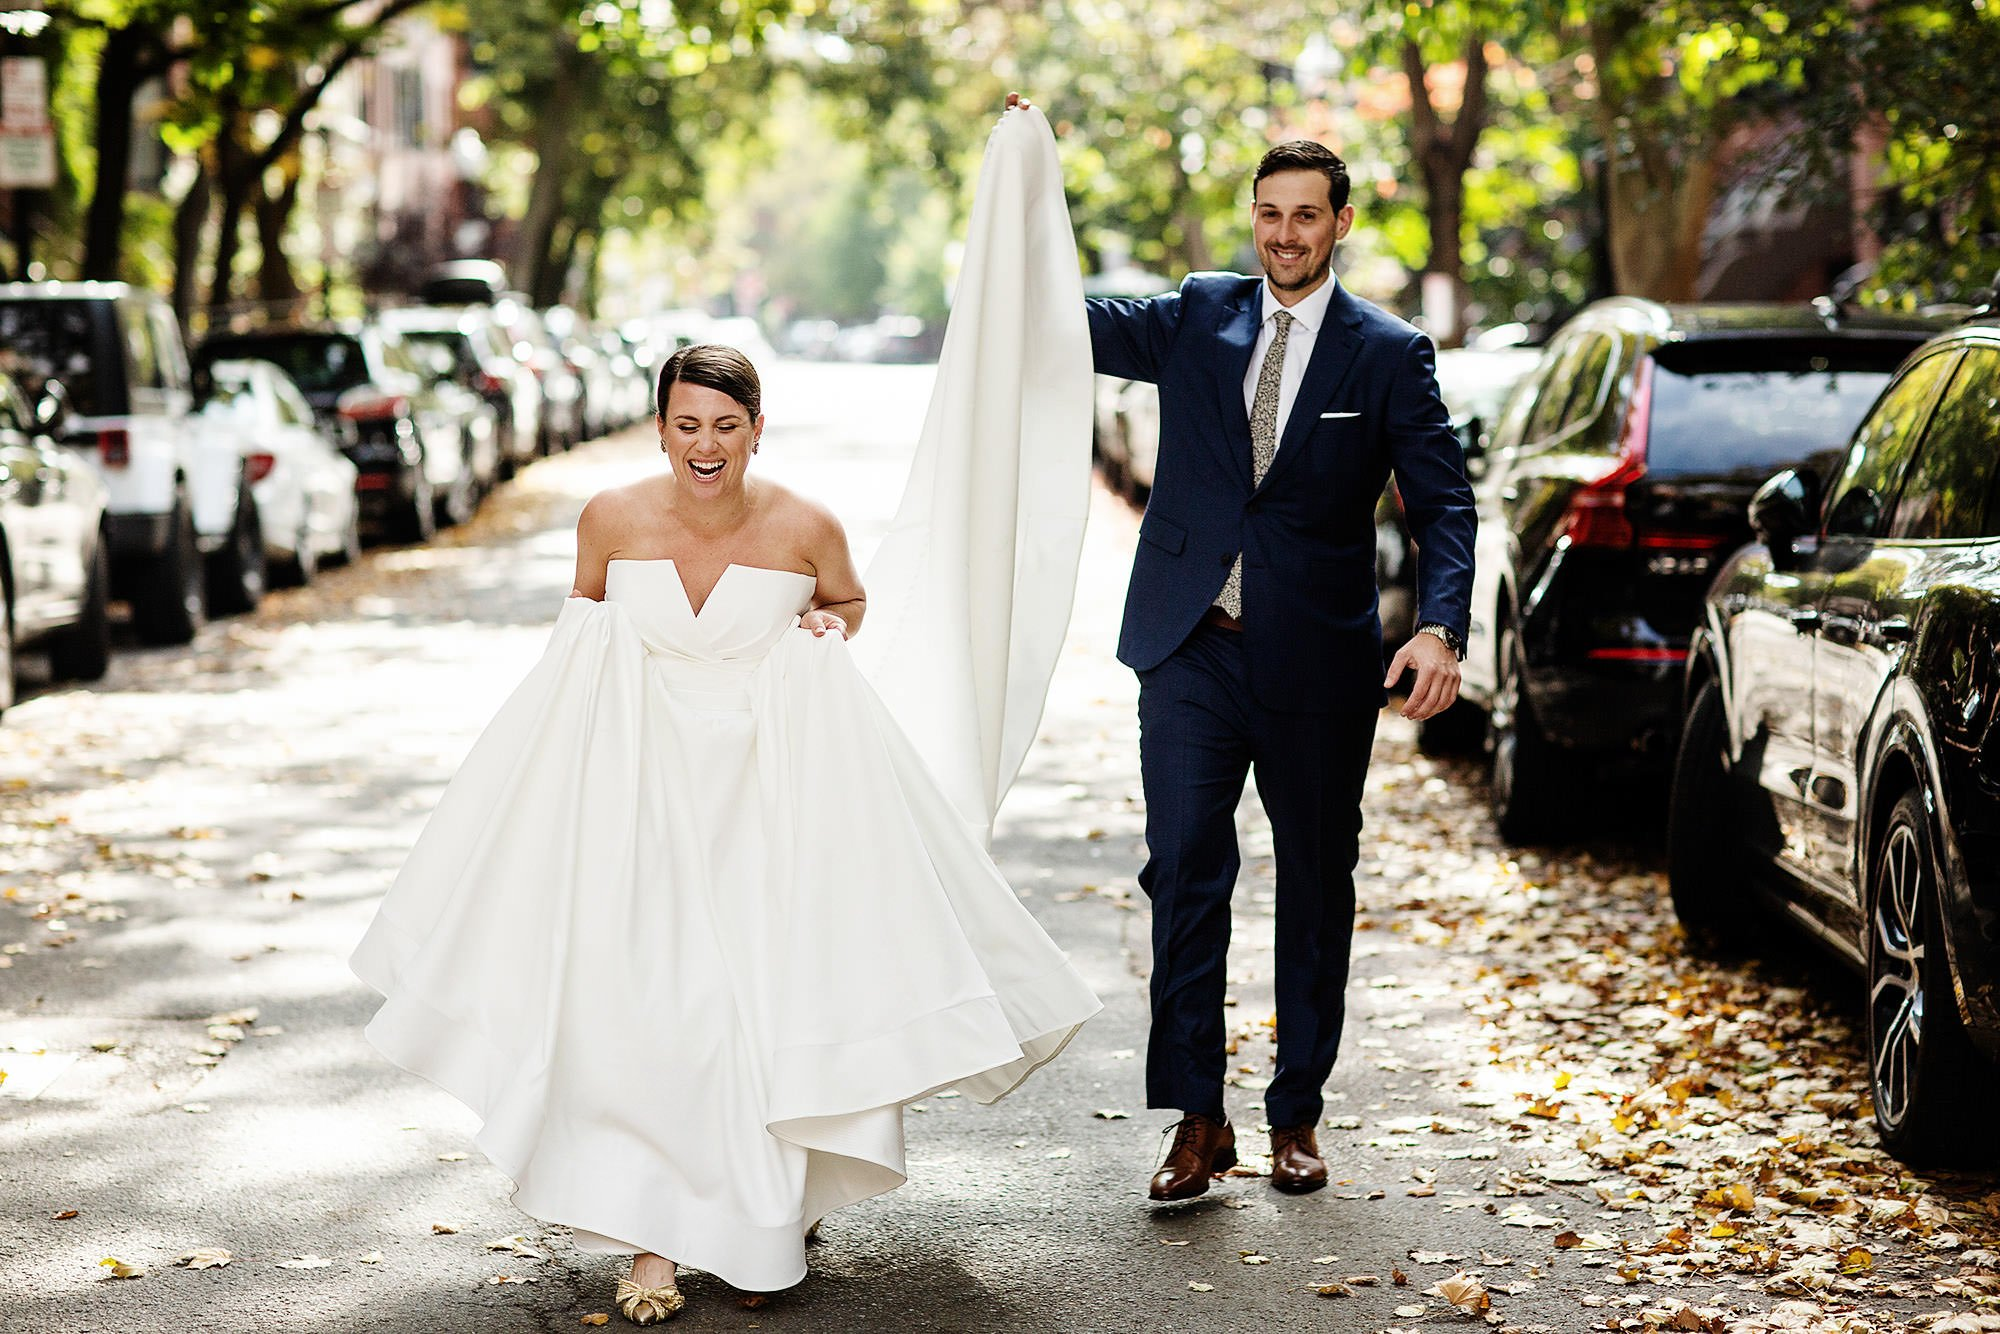 SRV Boston Wedding  I  The couple walk the streets of Boston, MA before their wedding ceremony.